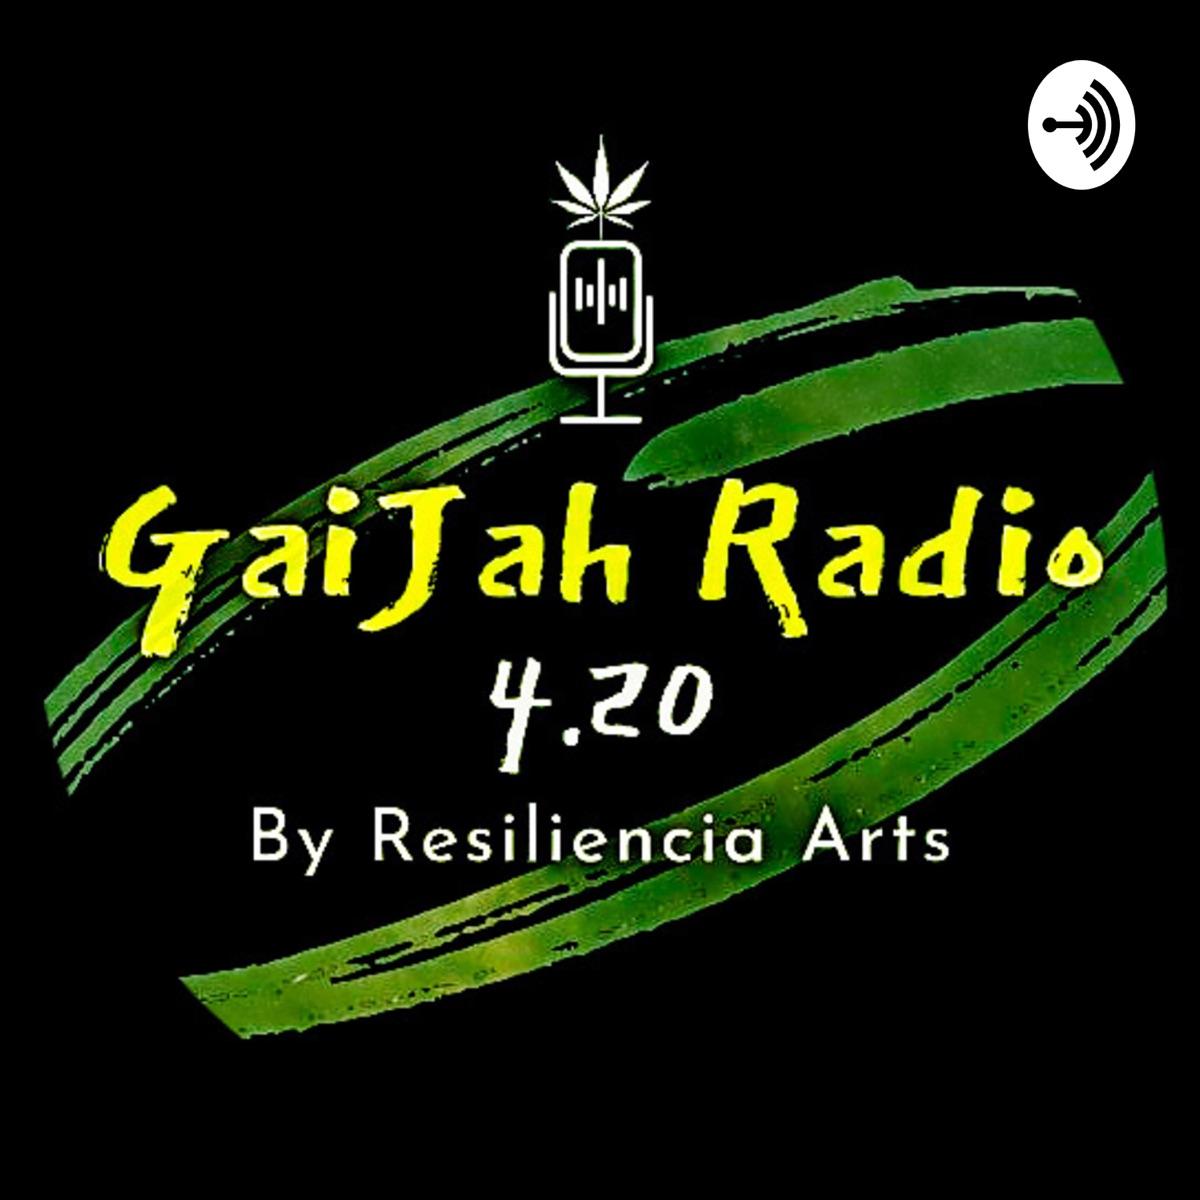 GaiJah Radio 4.20